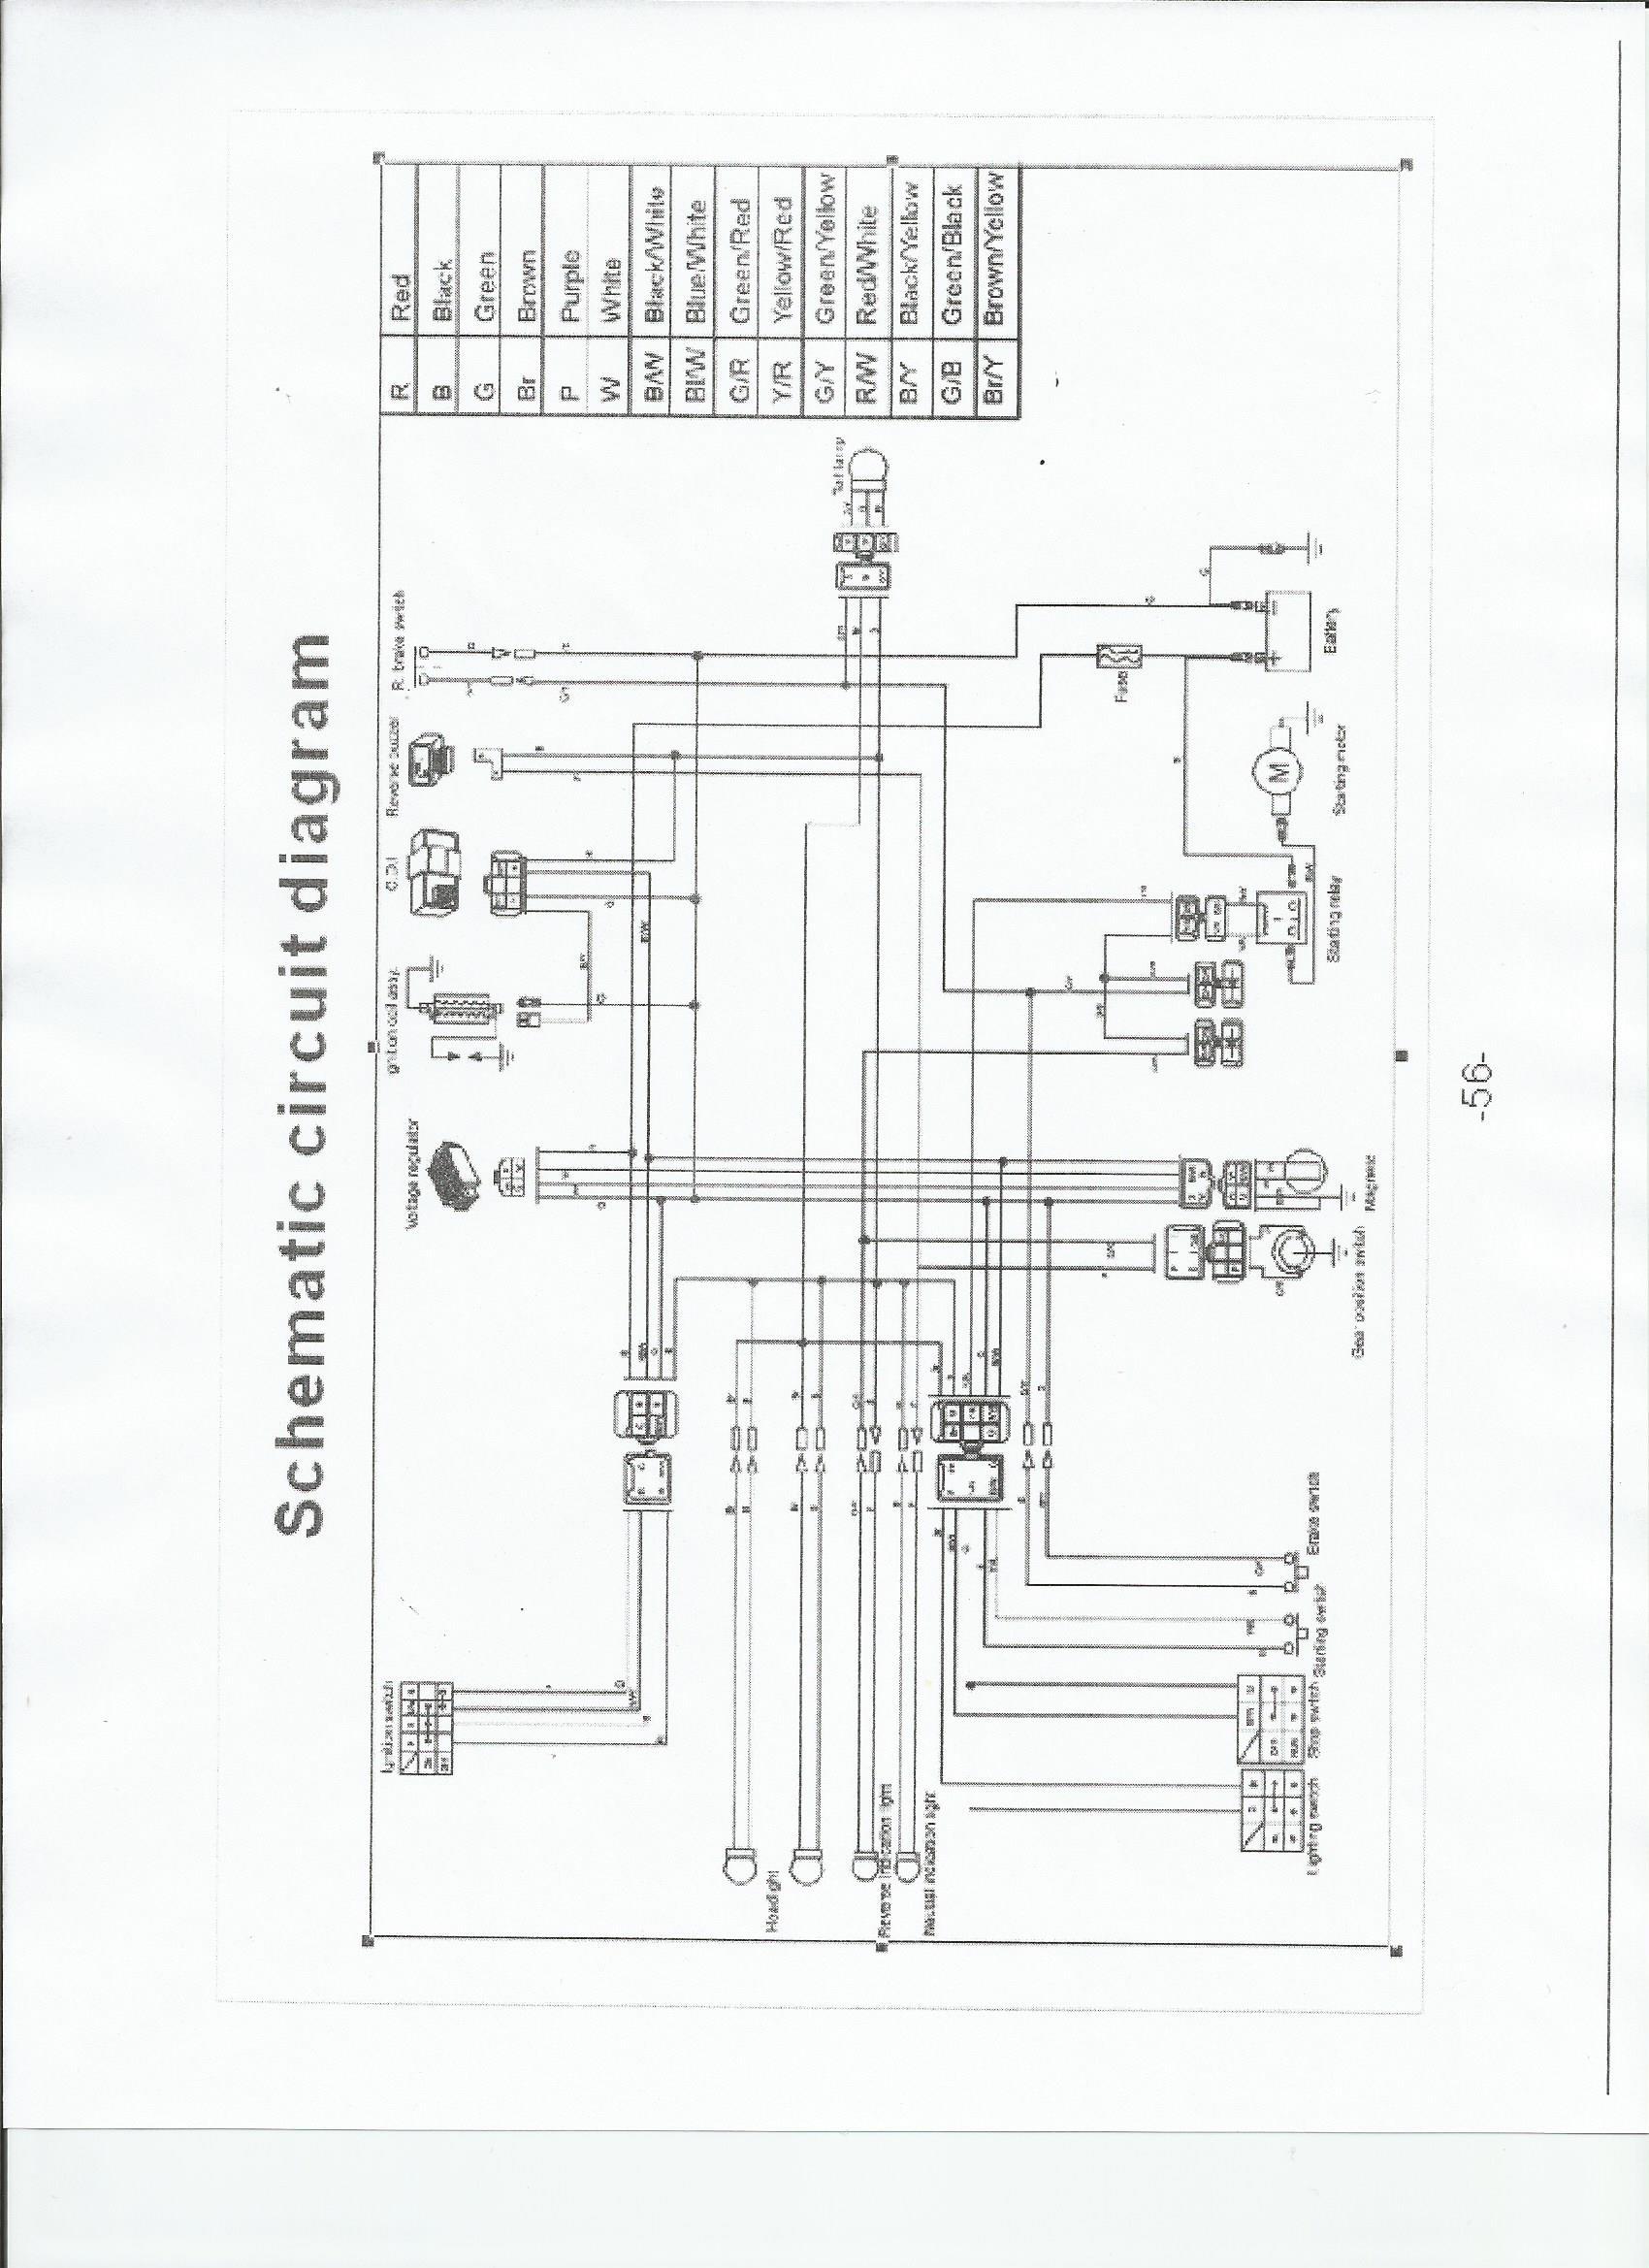 taotao mini and youth atv wiring schematic familygokarts support 110cc pocket bike wiring diagram tao 110cc wiring diagram [ 1700 x 2338 Pixel ]